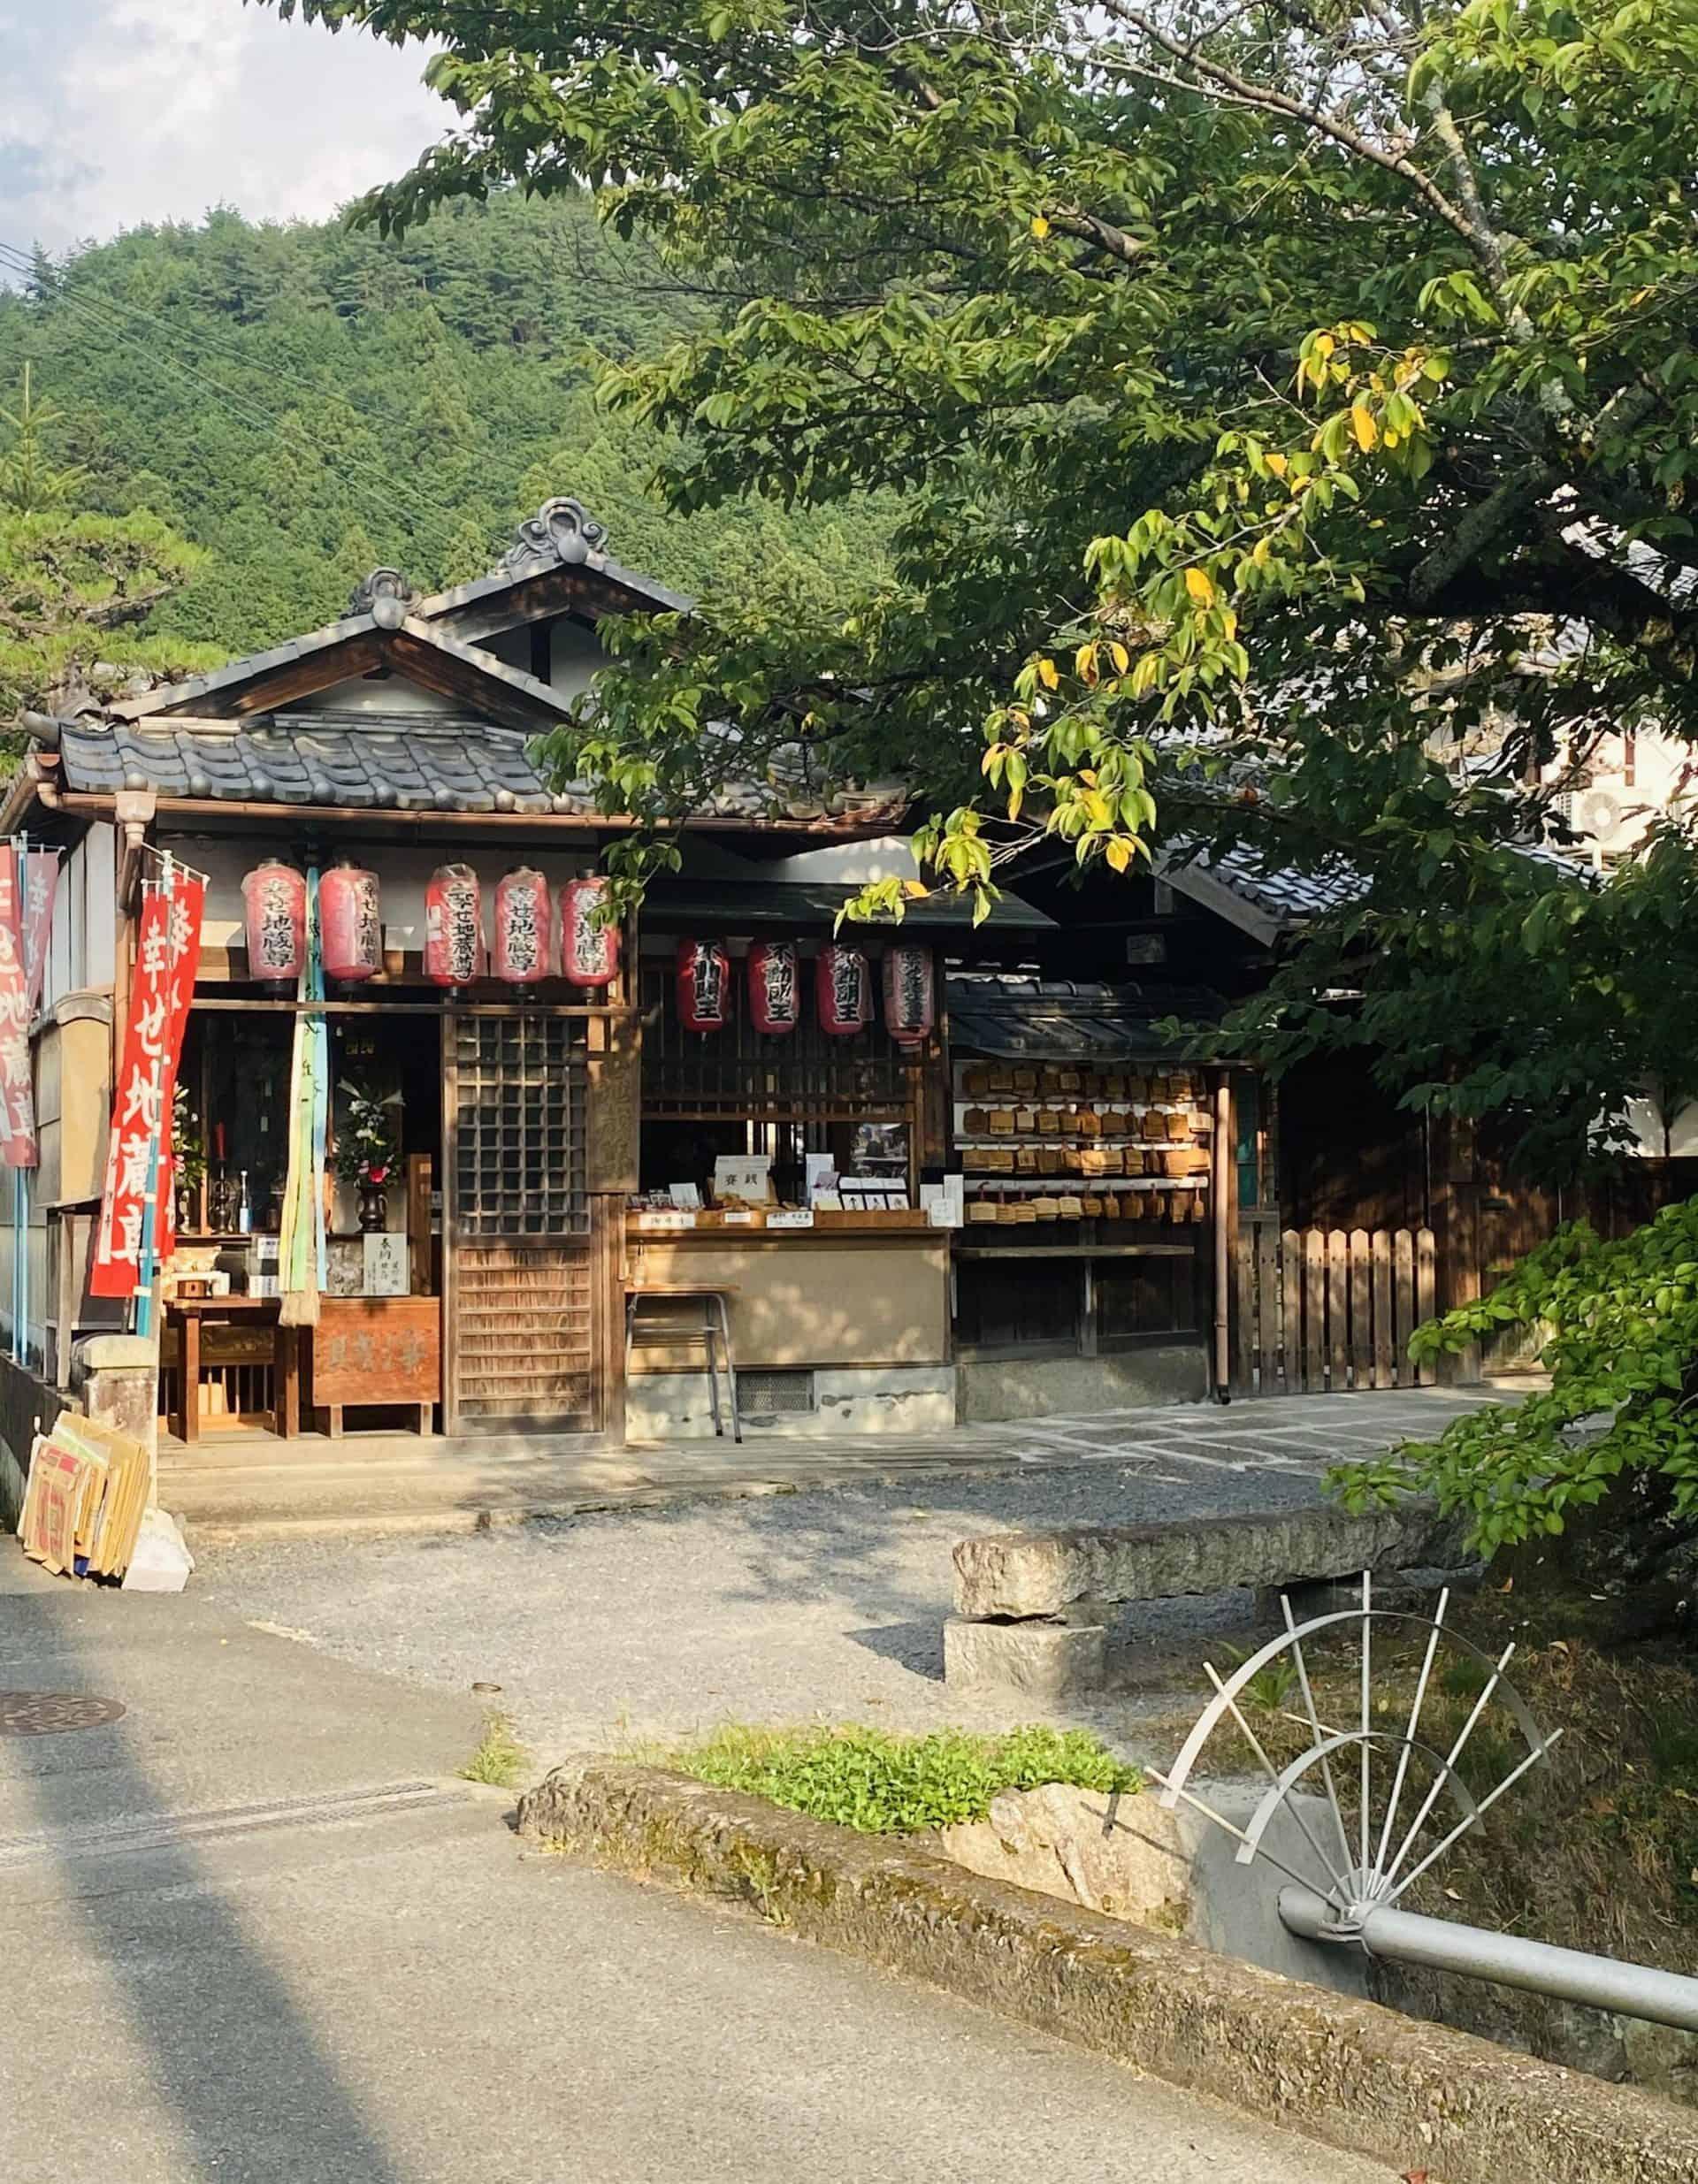 kyoto_essential_Philosopherspath_Point4_SHIAWASE JIZO_1